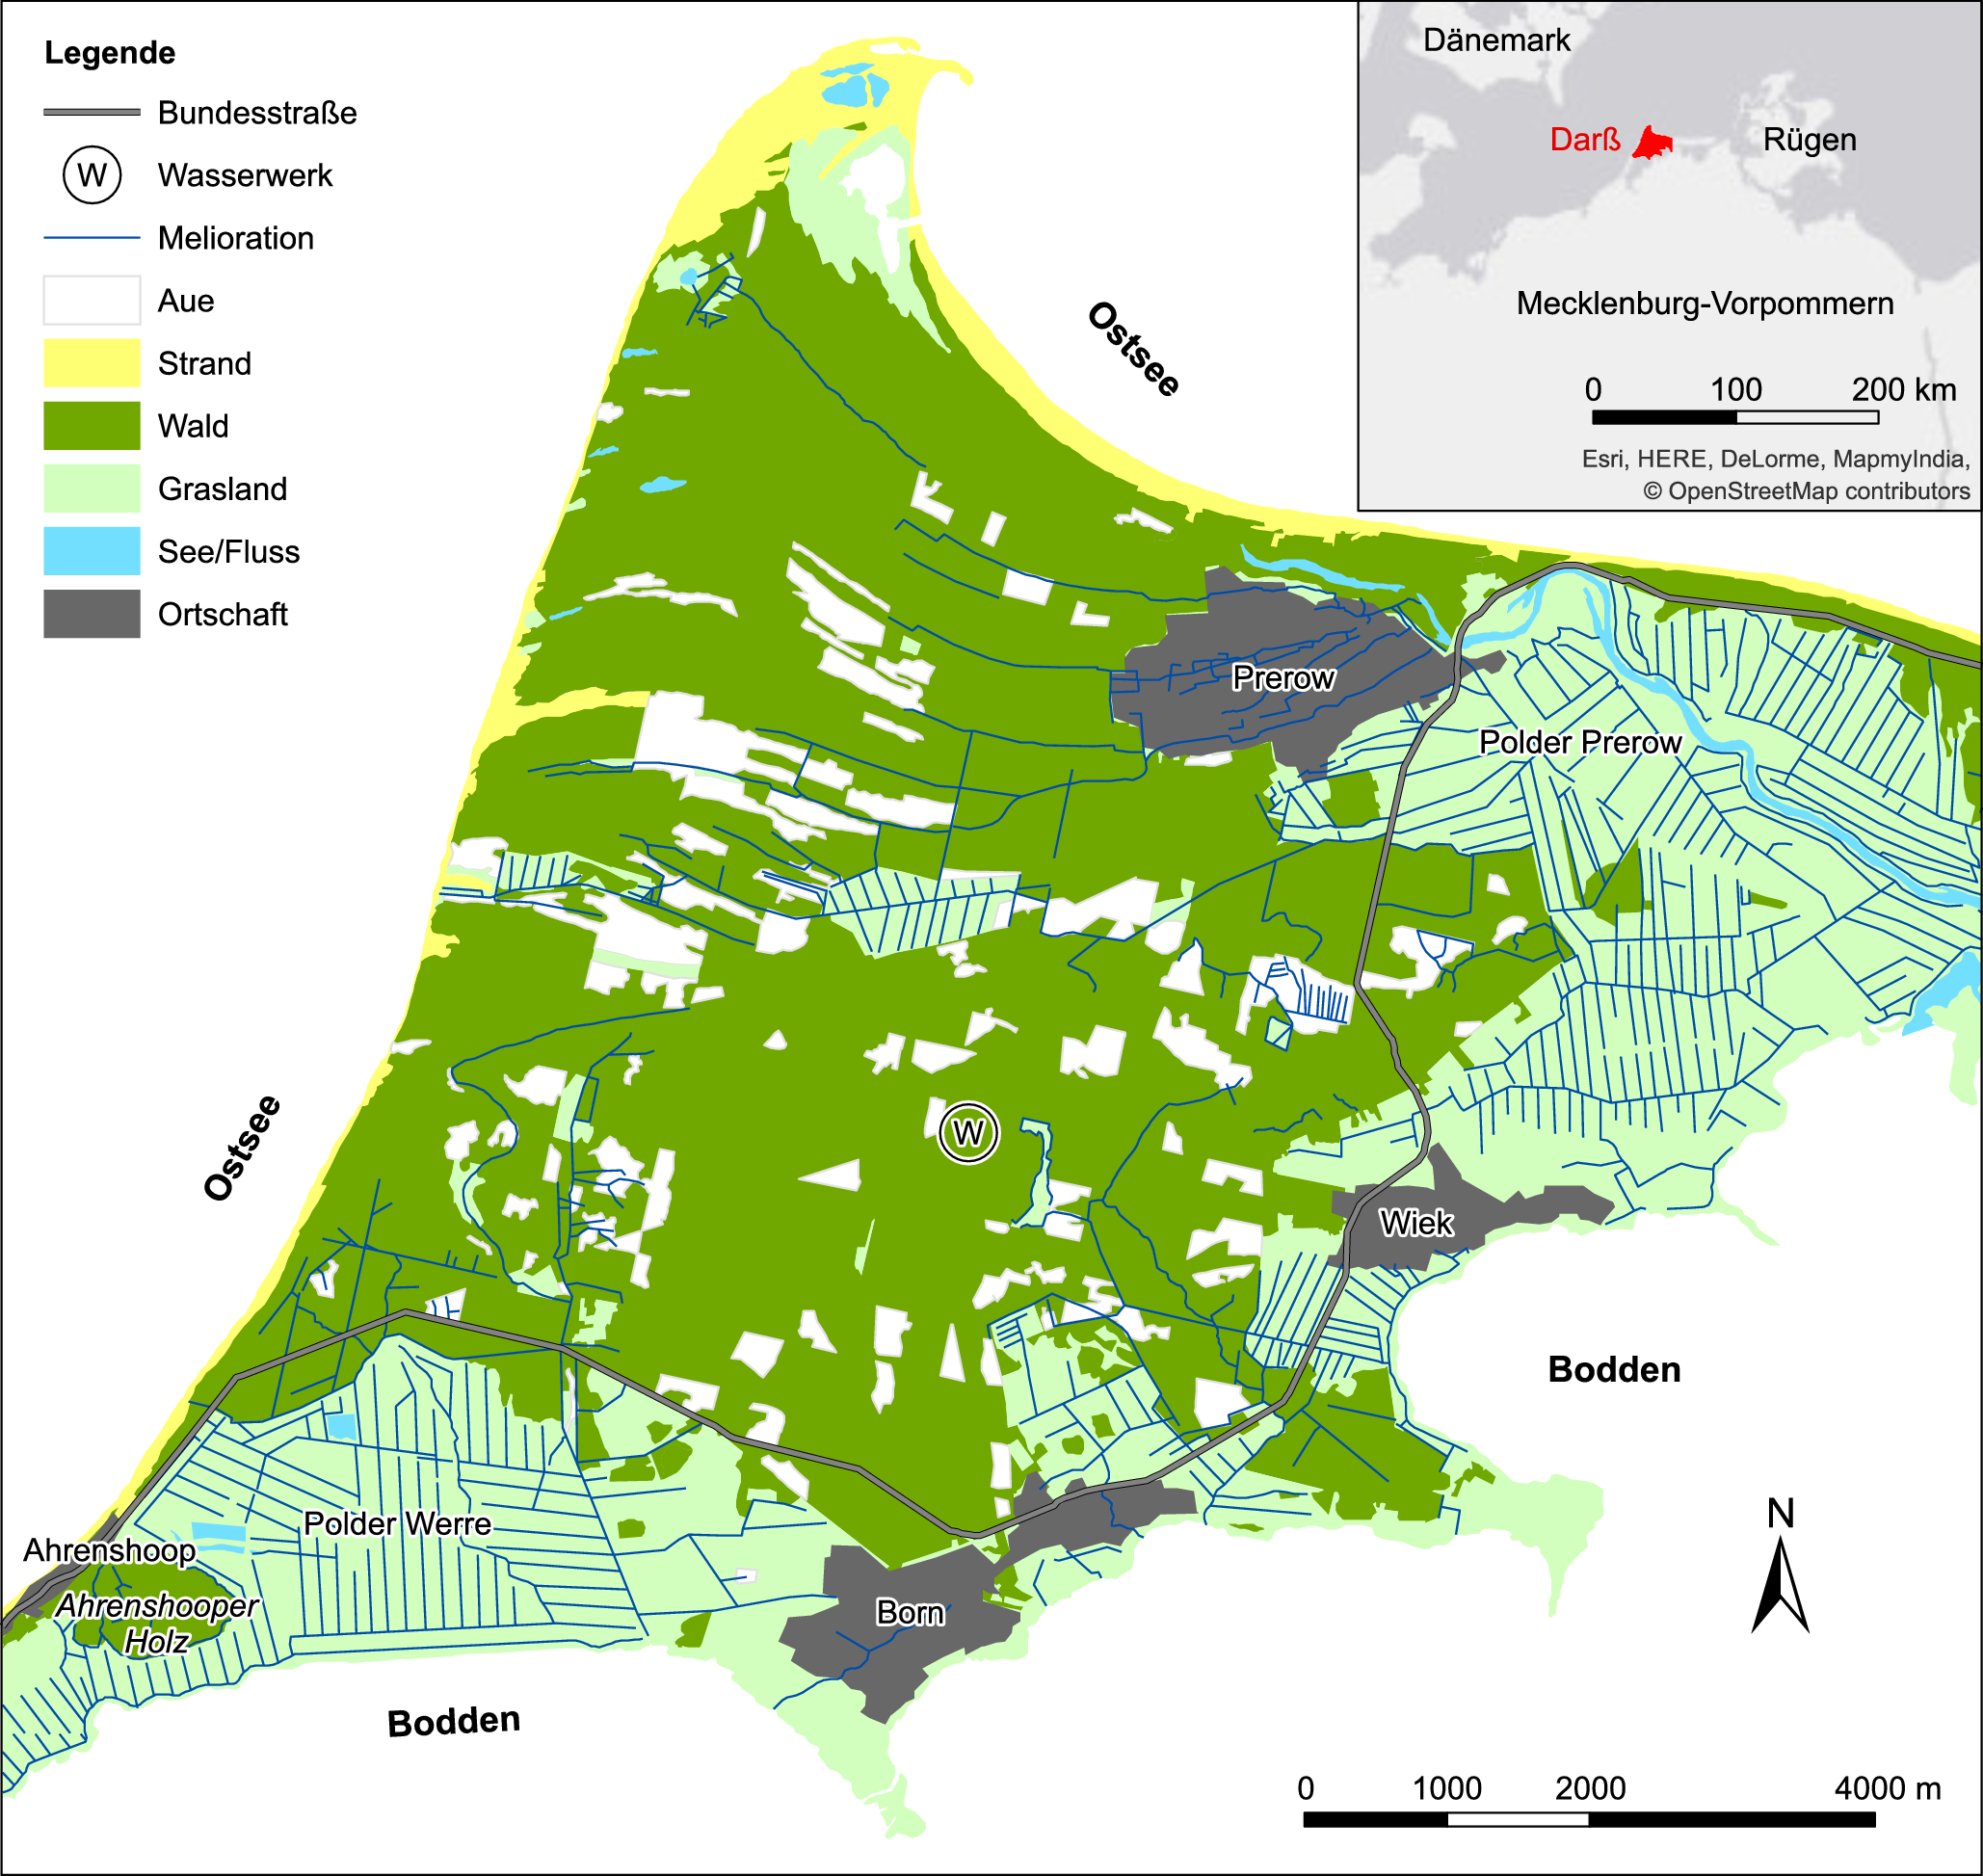 Karte Norwegen D303244nemark.Grundwasserspiegel Karte Berlin